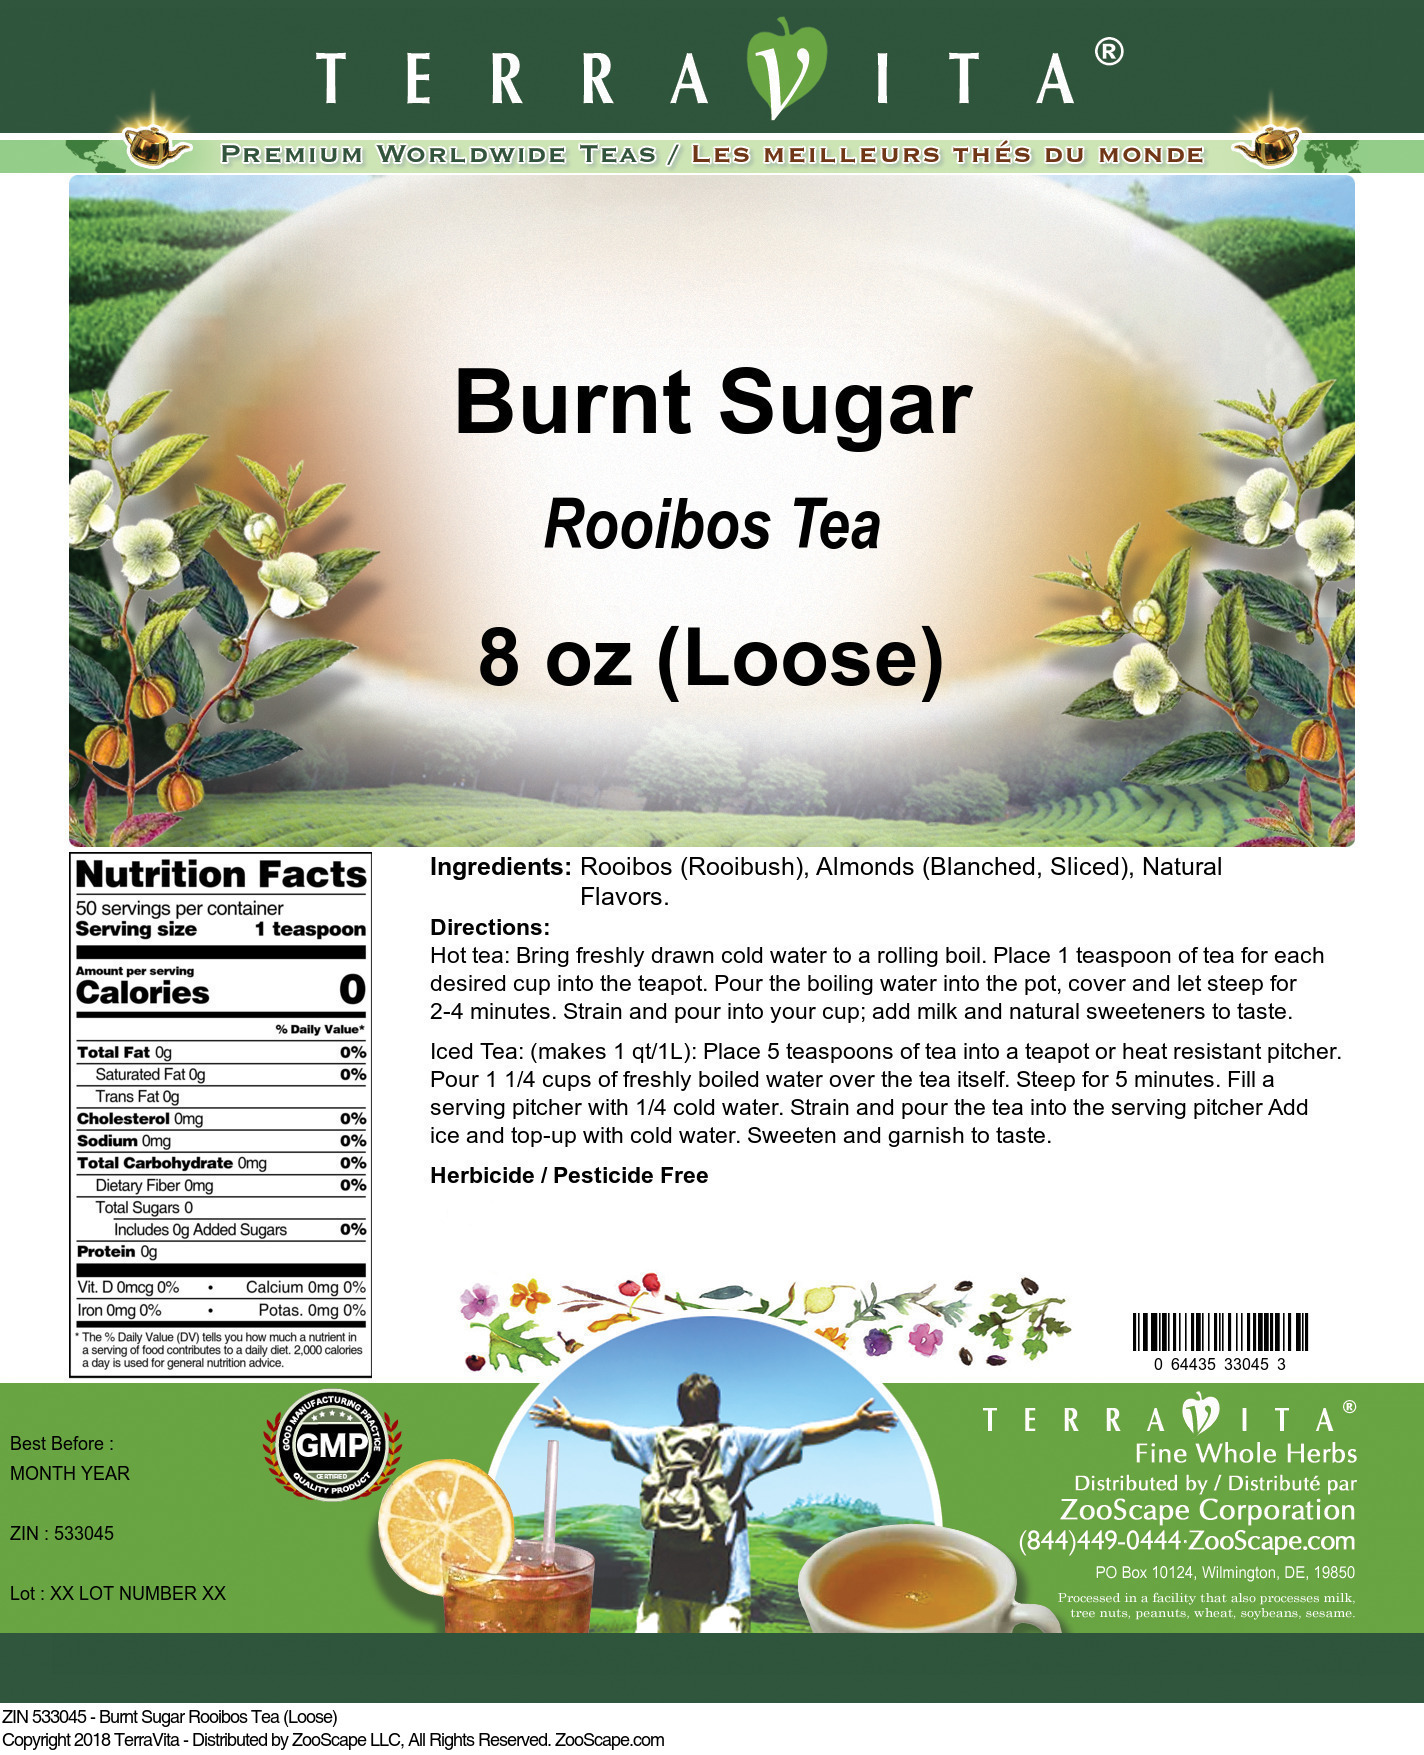 Burnt Sugar Rooibos Tea (Loose)